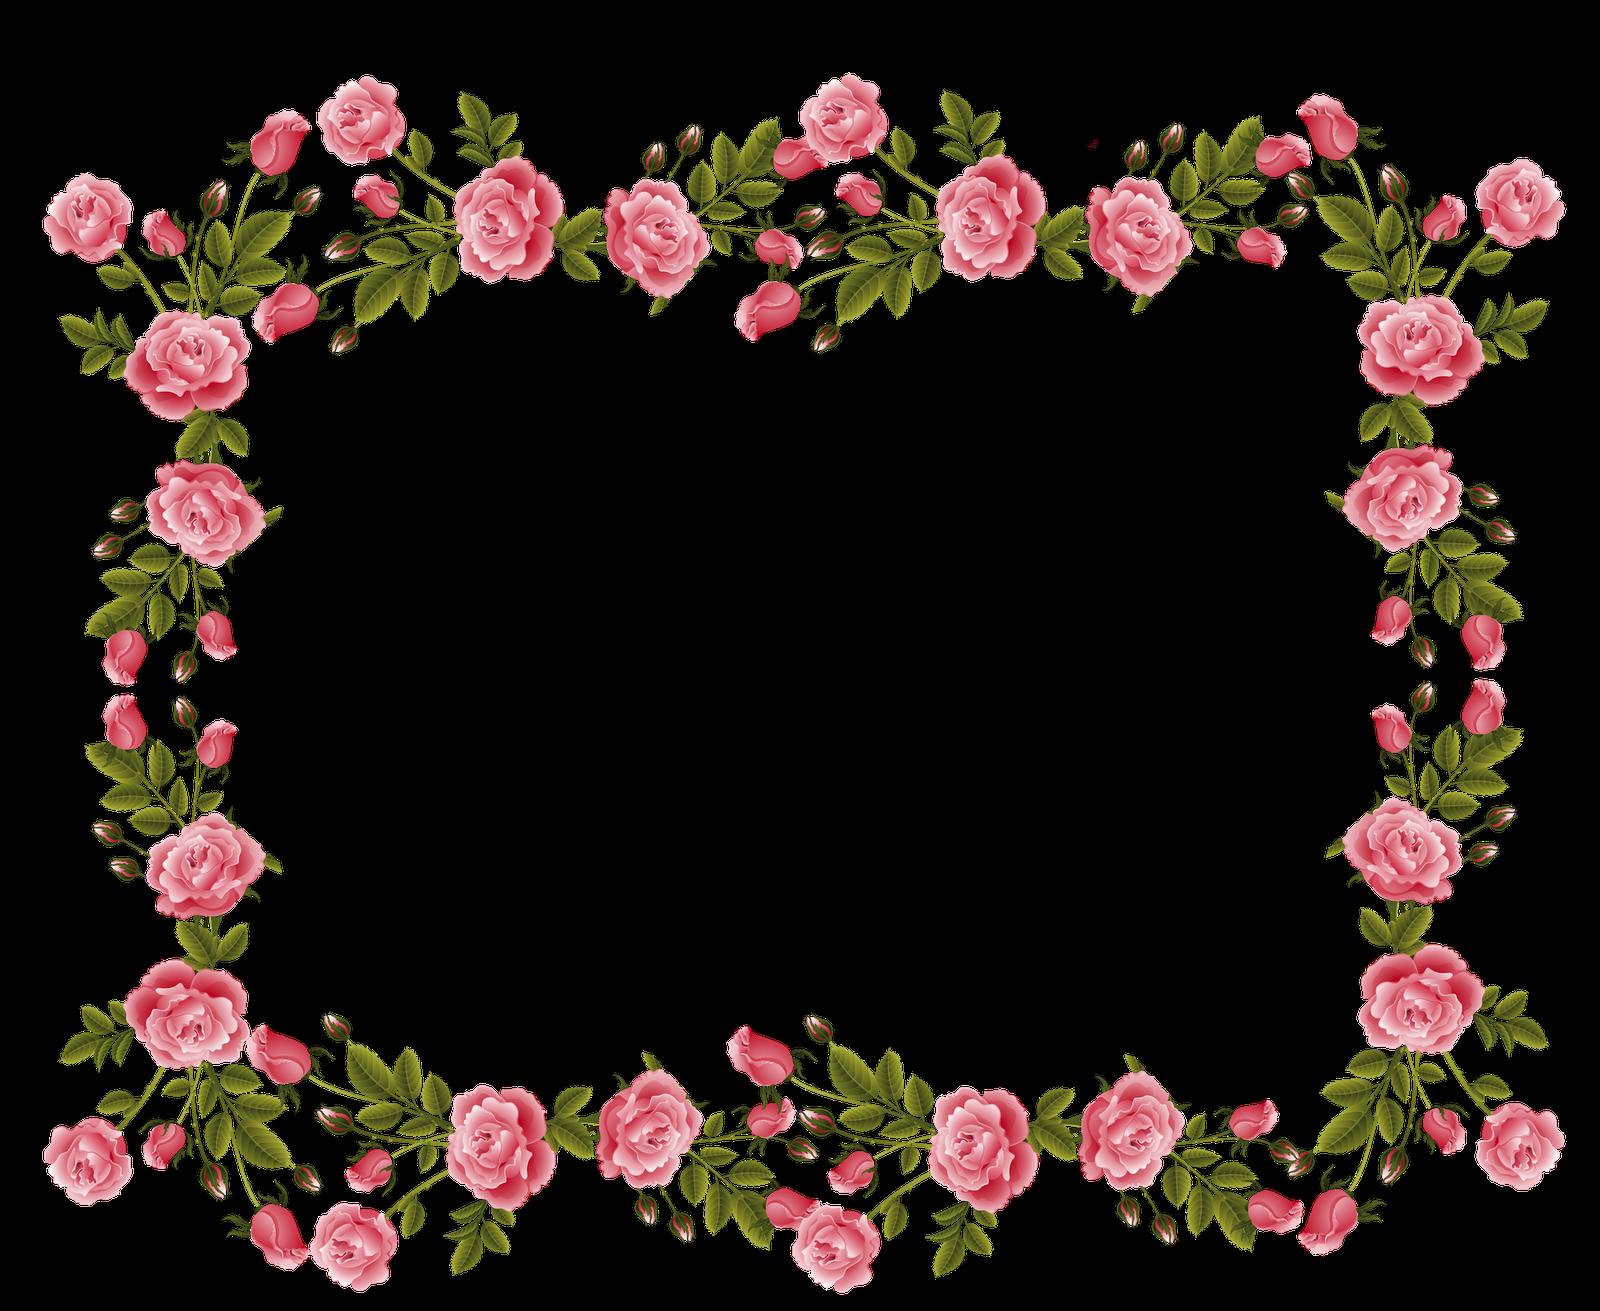 Vintage flower clipart free graphic transparent Vintage Border Frame Hd Wallpaper clipart free image graphic transparent